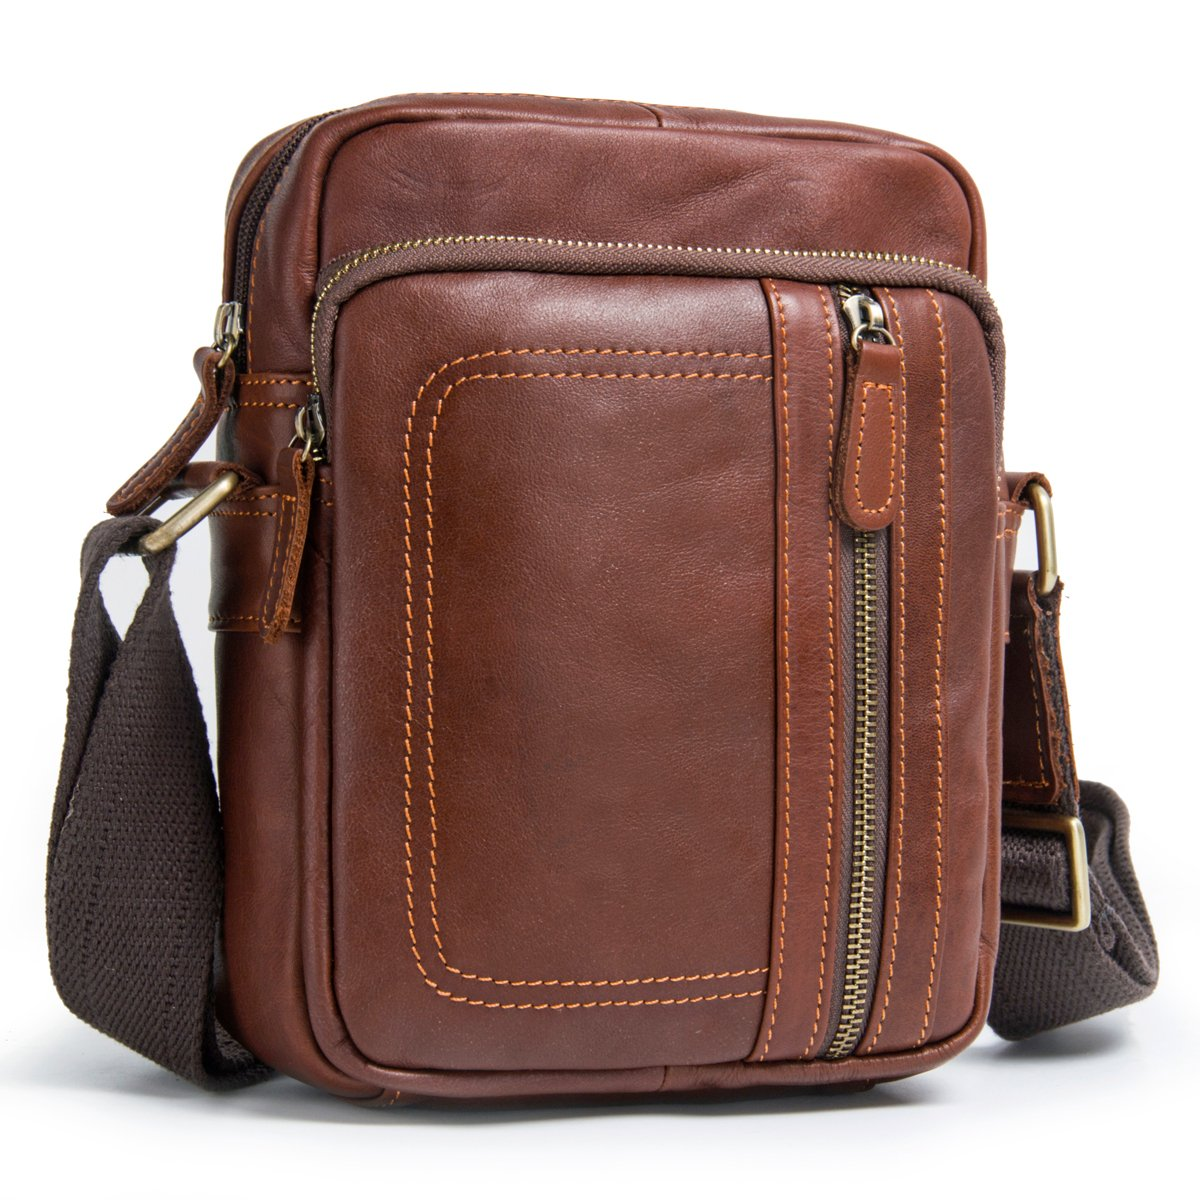 Contacts Real Leather Mens iPad Messenger CrossBody Bag Travel Working Tab Handbag (Brown)